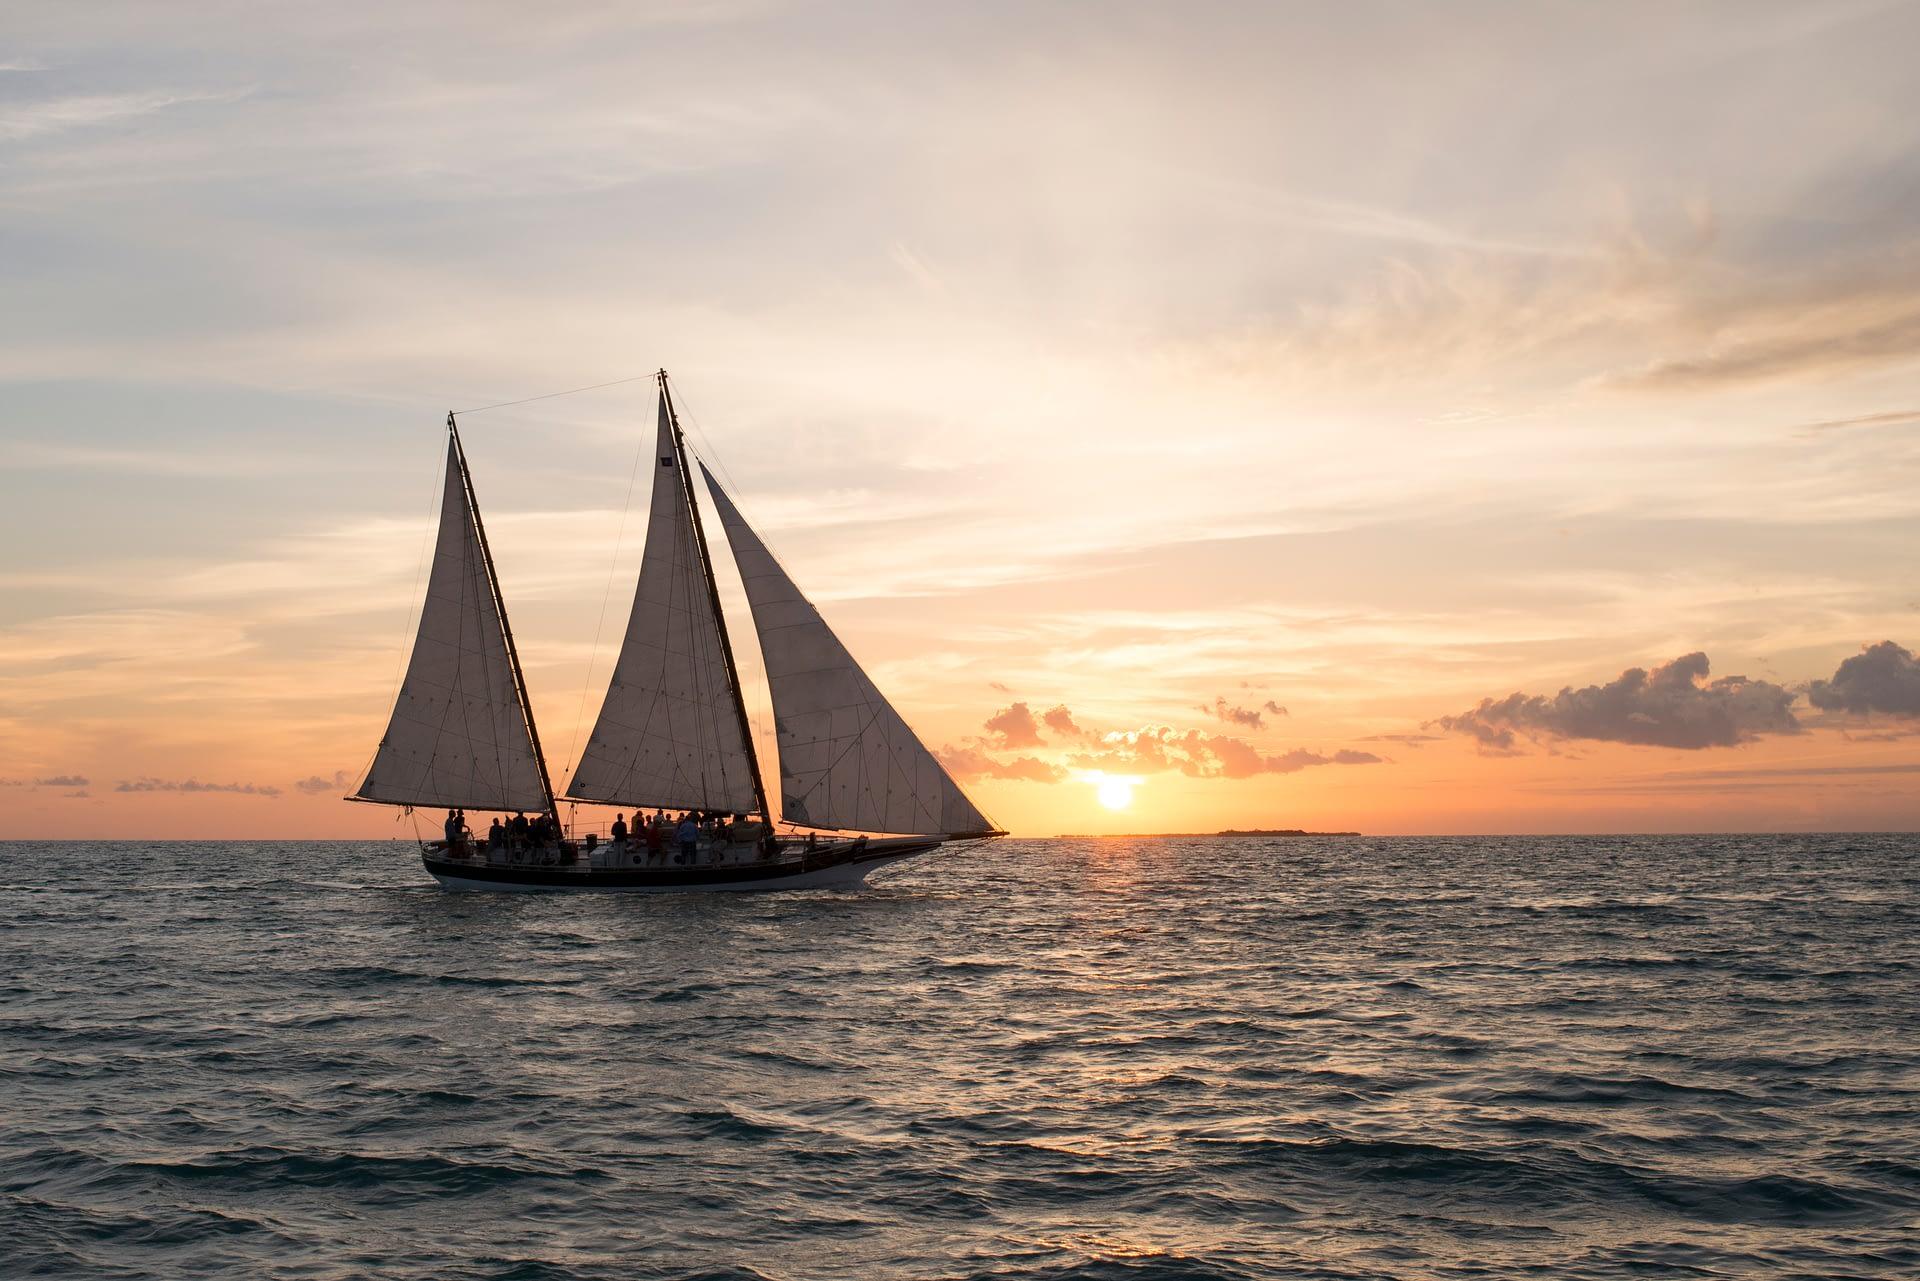 Schooner Champagne Sunset Sail